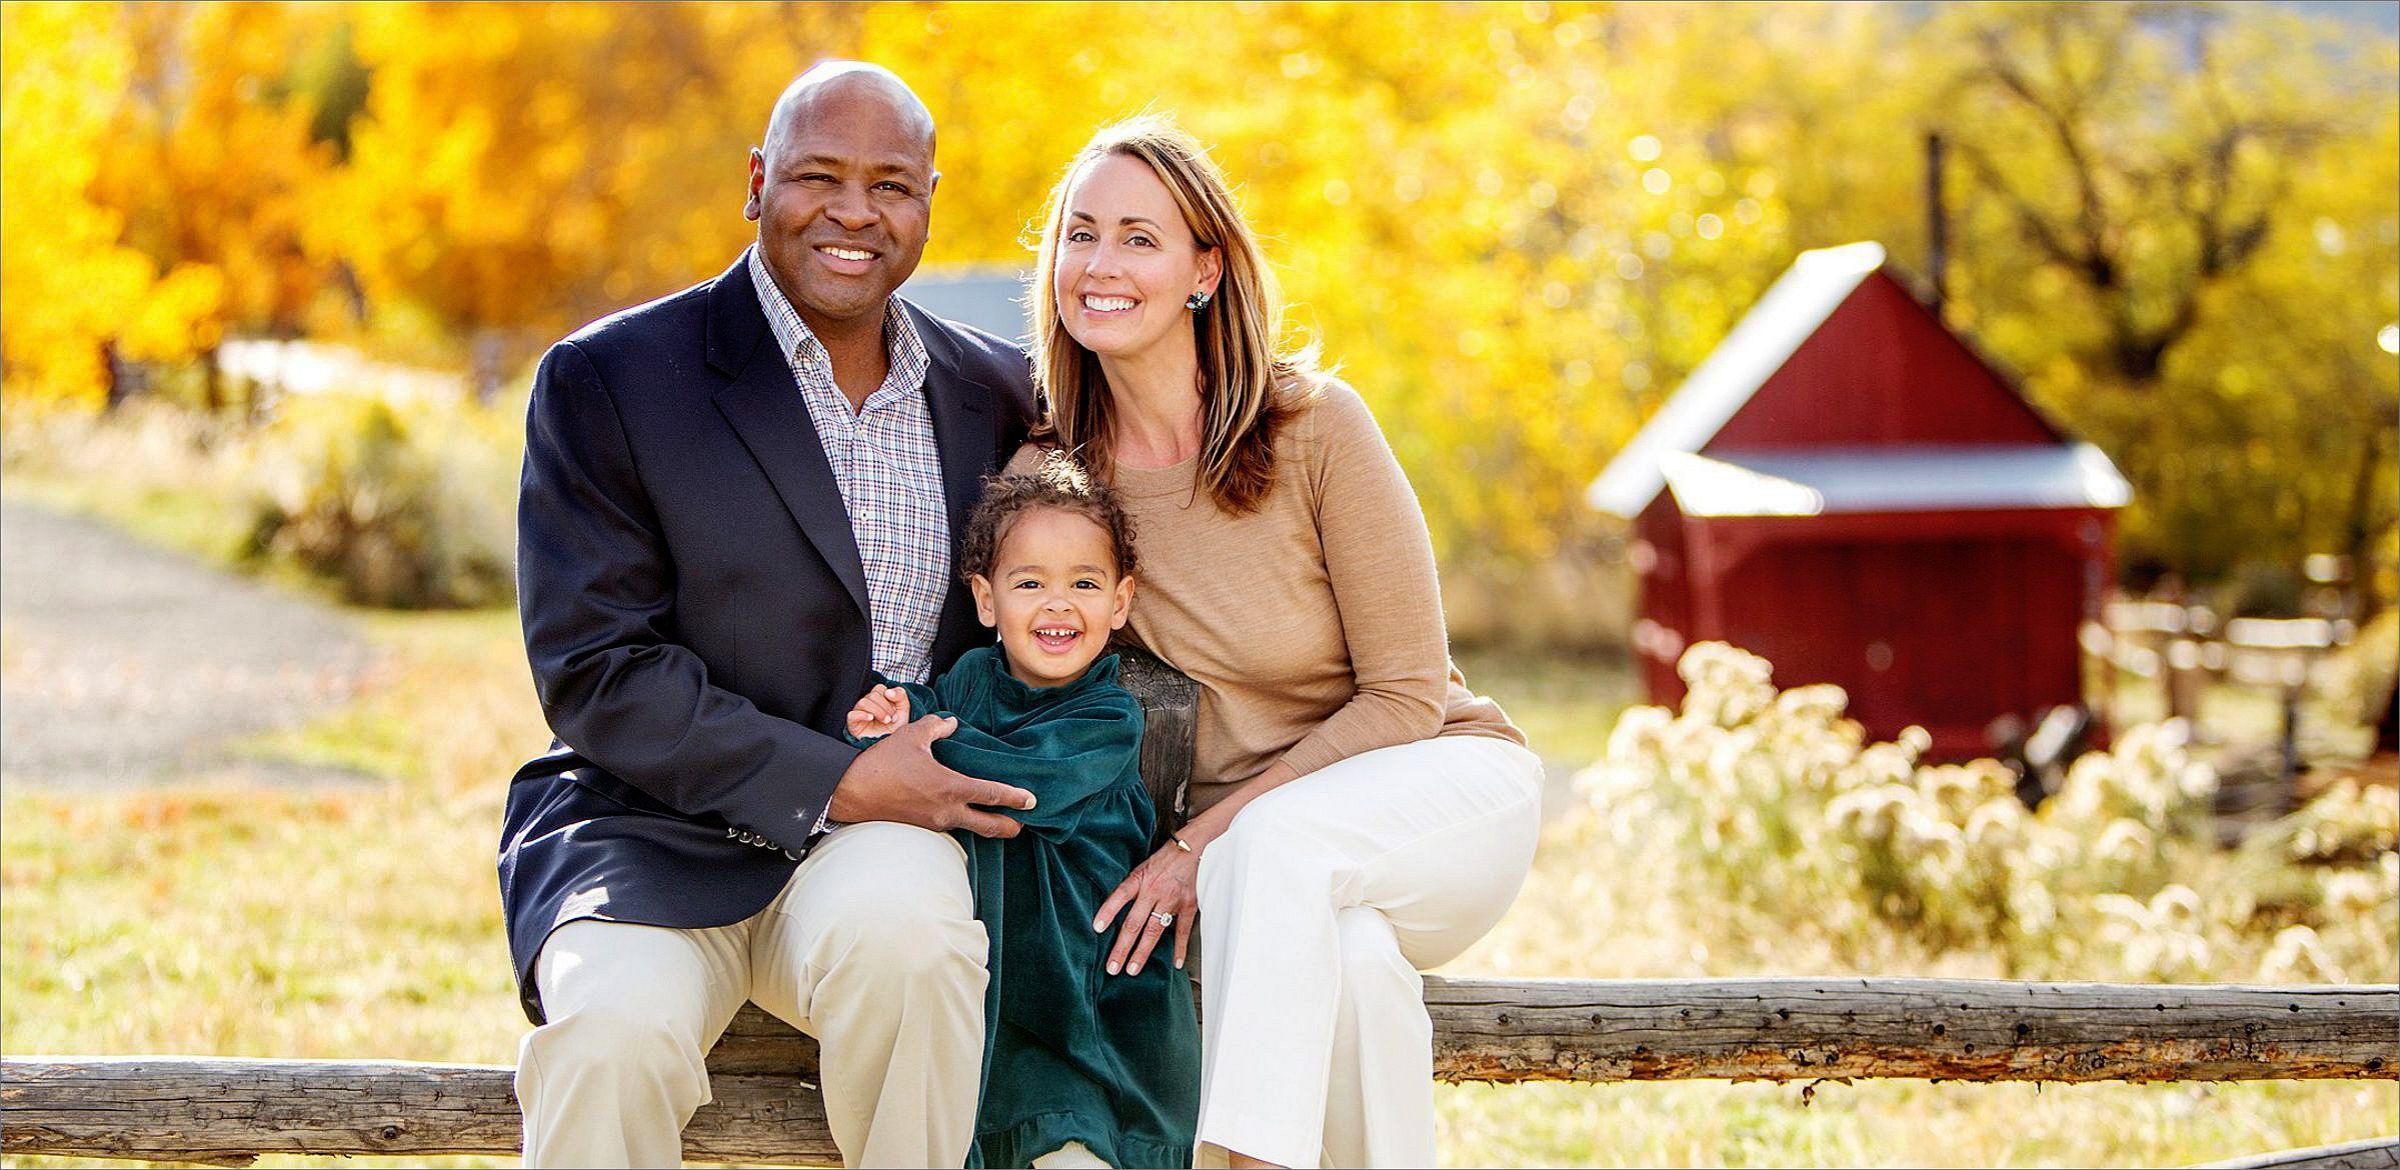 Golden Family Photoshoot